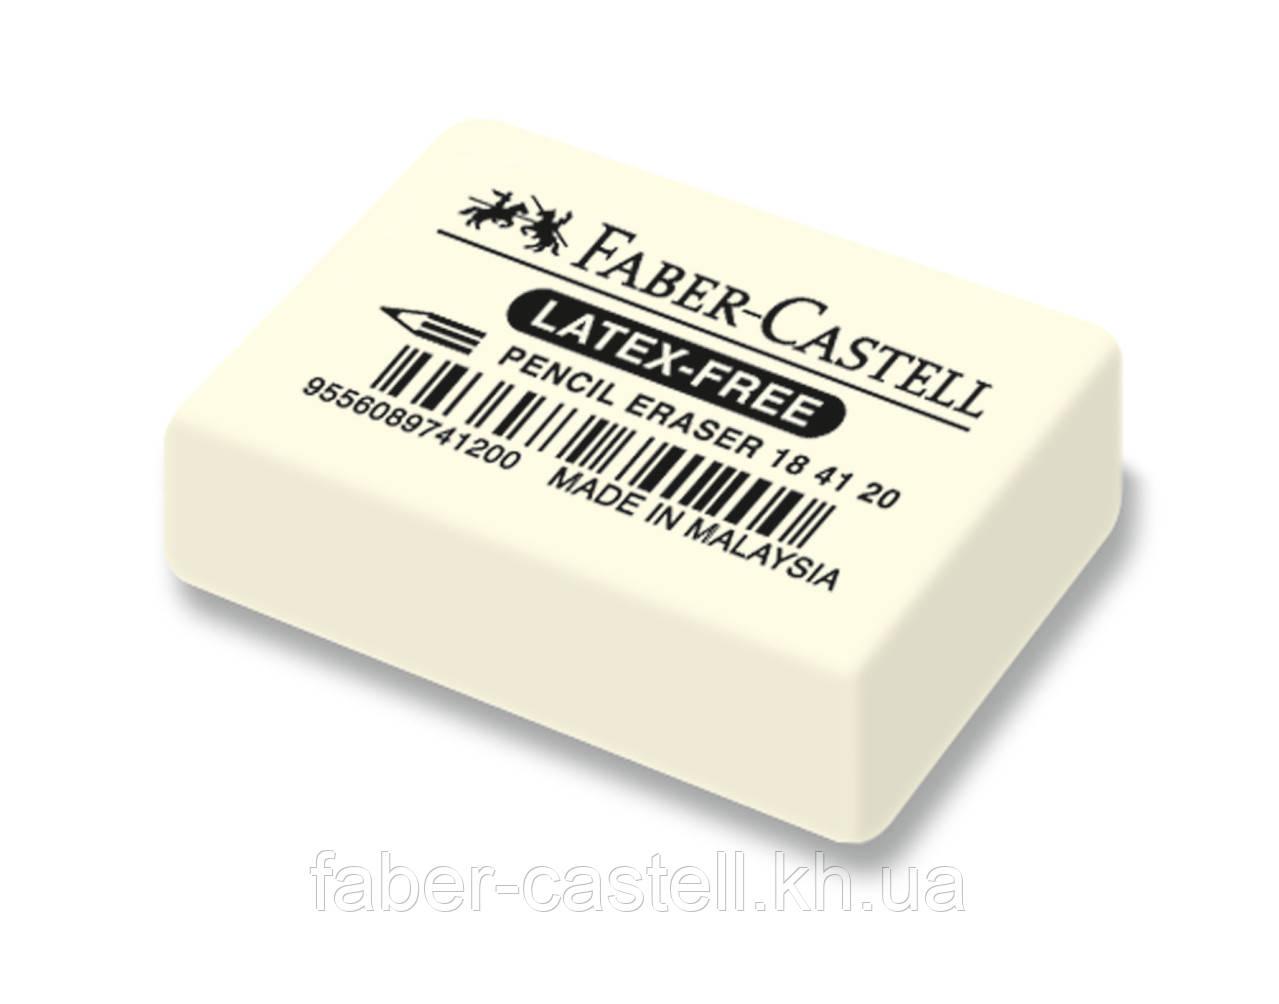 Ластик Faber-Castell  7041-20 каучуковый белый, 184120